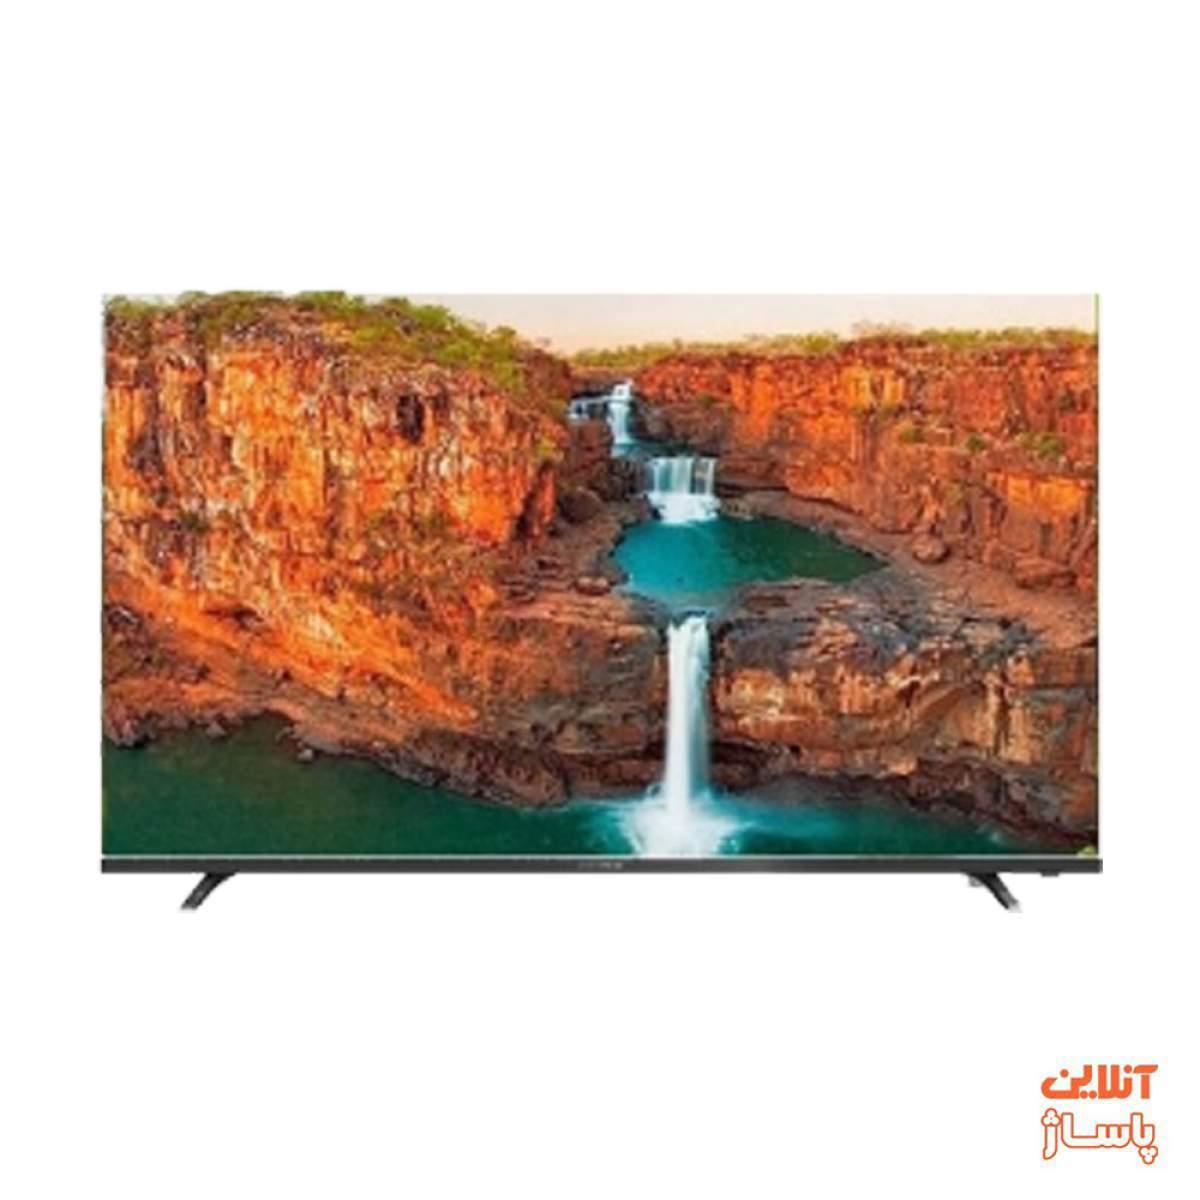 تلویزیون ال ای دی دوو مدل DLE-49H1811U سایز 49 اینچ